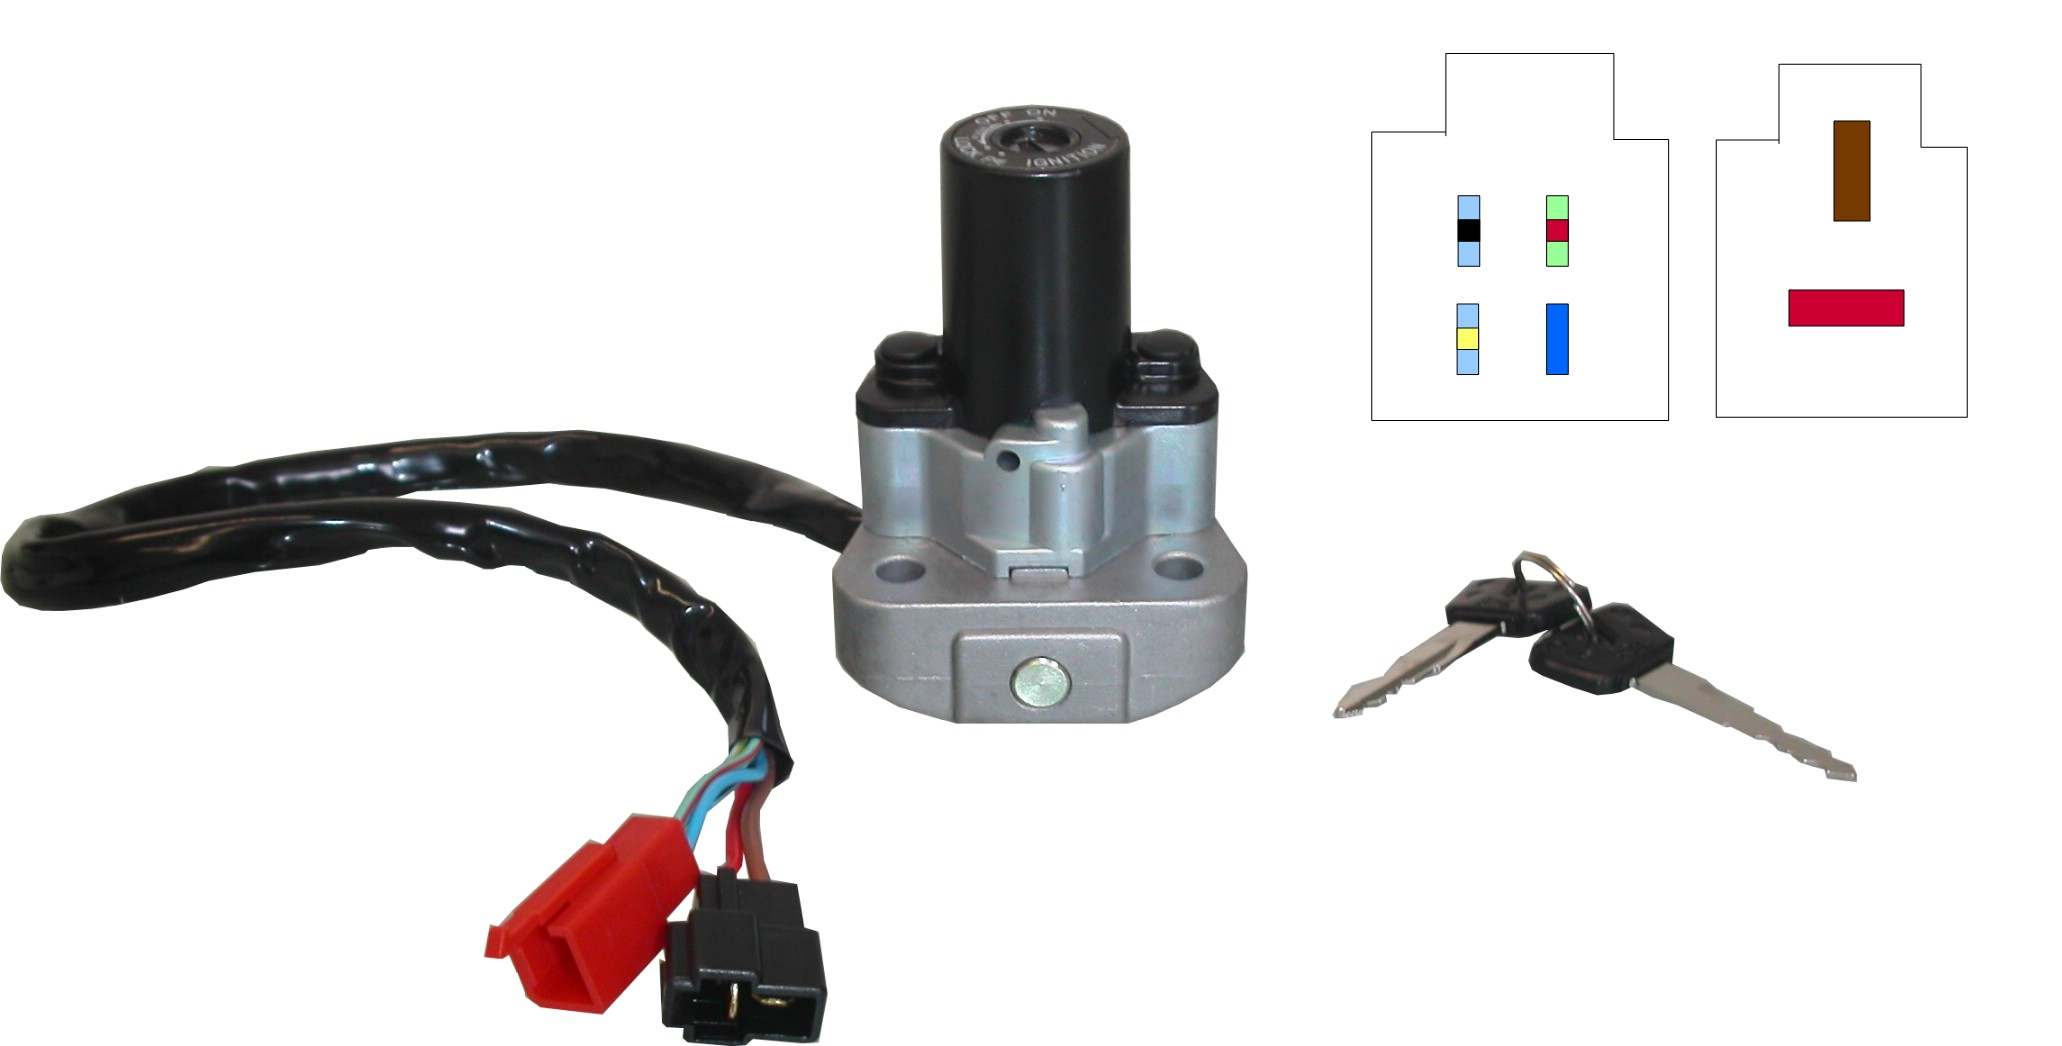 Yamaha-FZR-1000-RU-EXUP-EU-1994-1995-Ignition-Switch-Each-4JH-82501-03